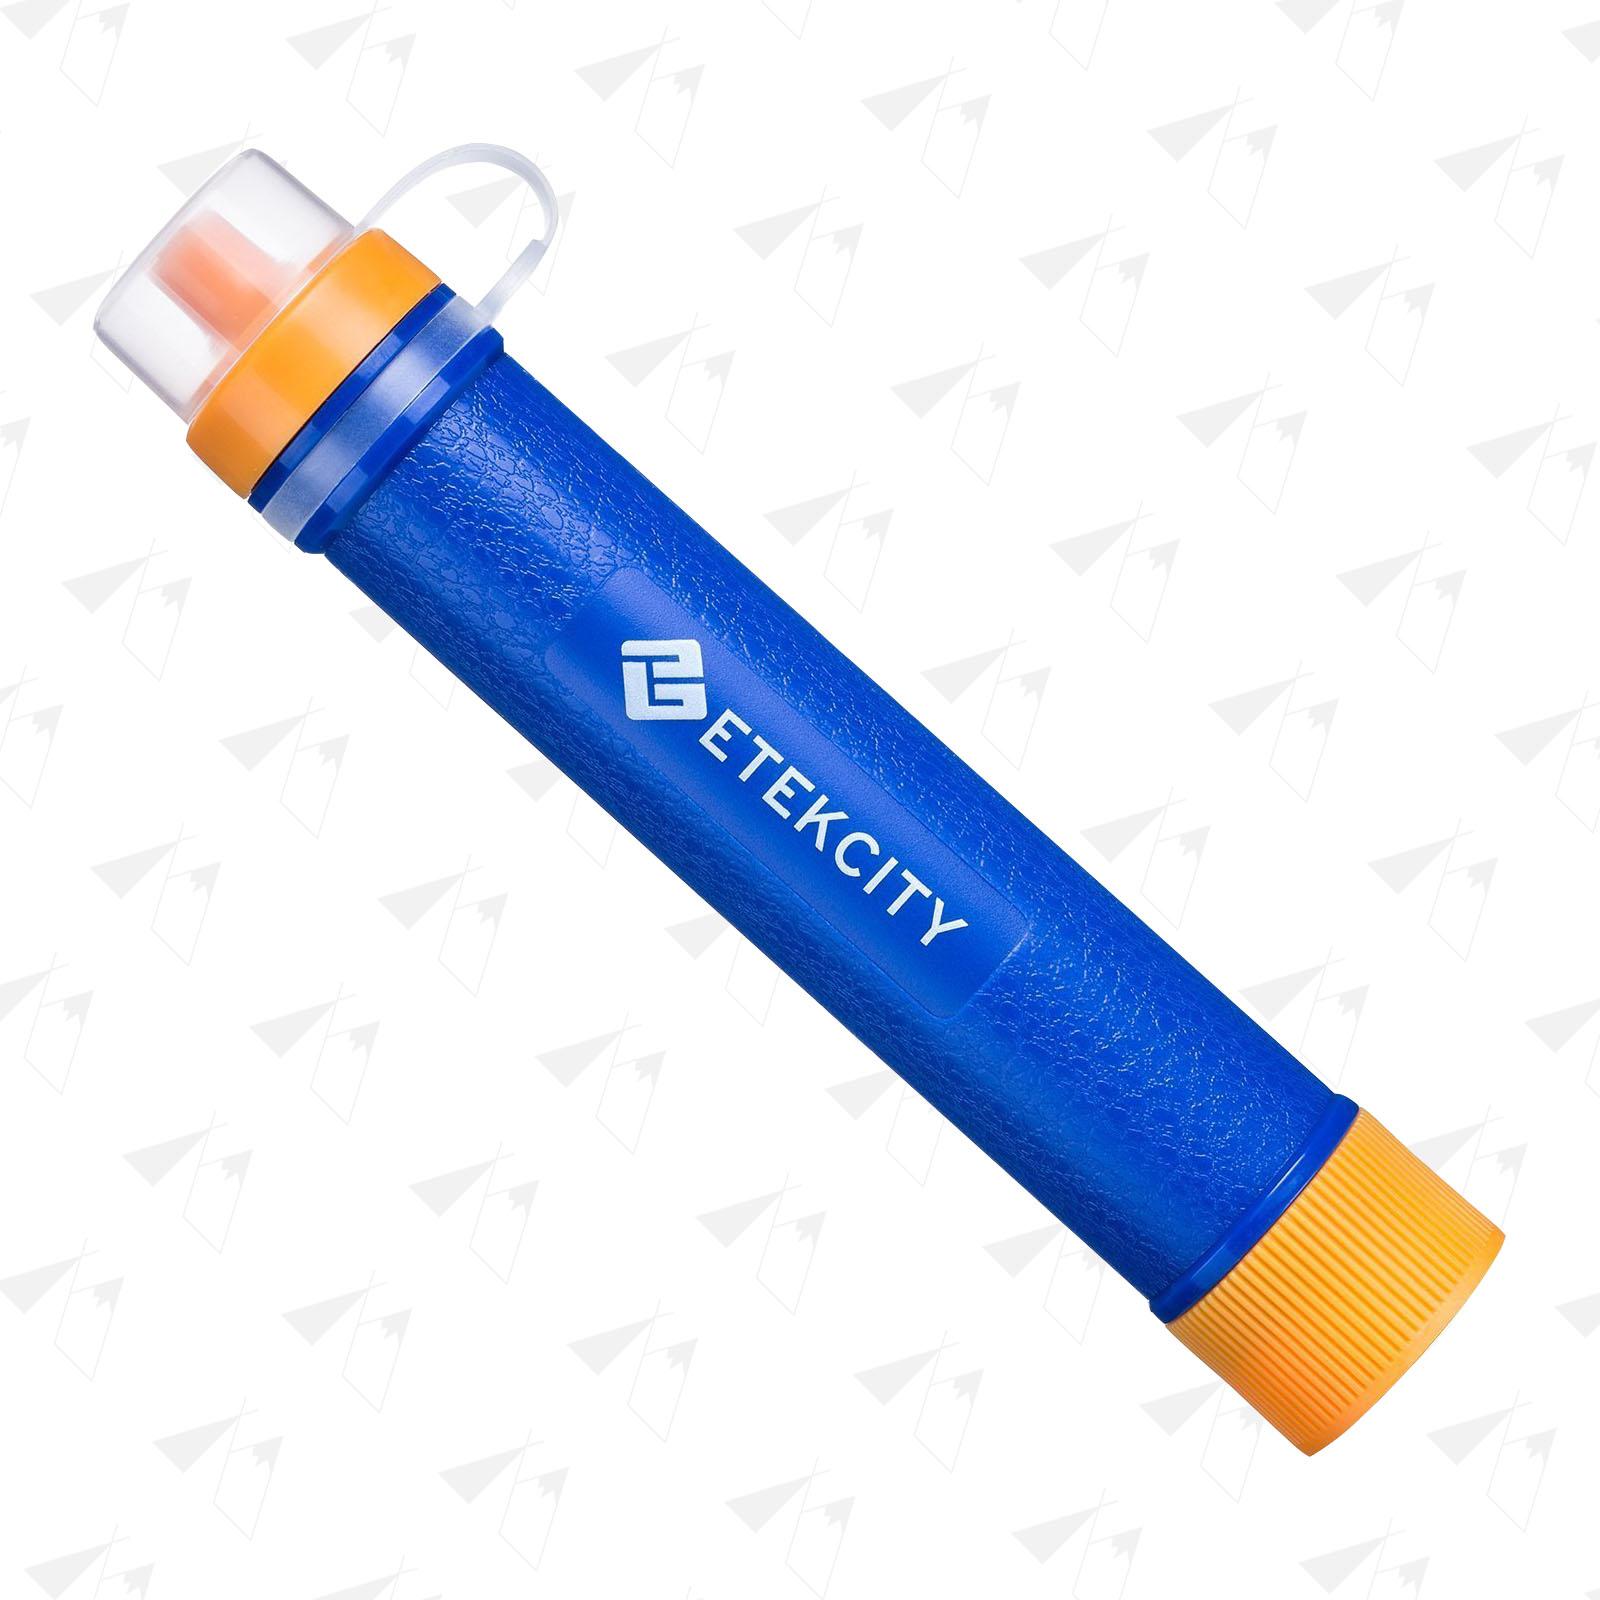 Etekcity Water Filtration Straw | $15 | Amazon